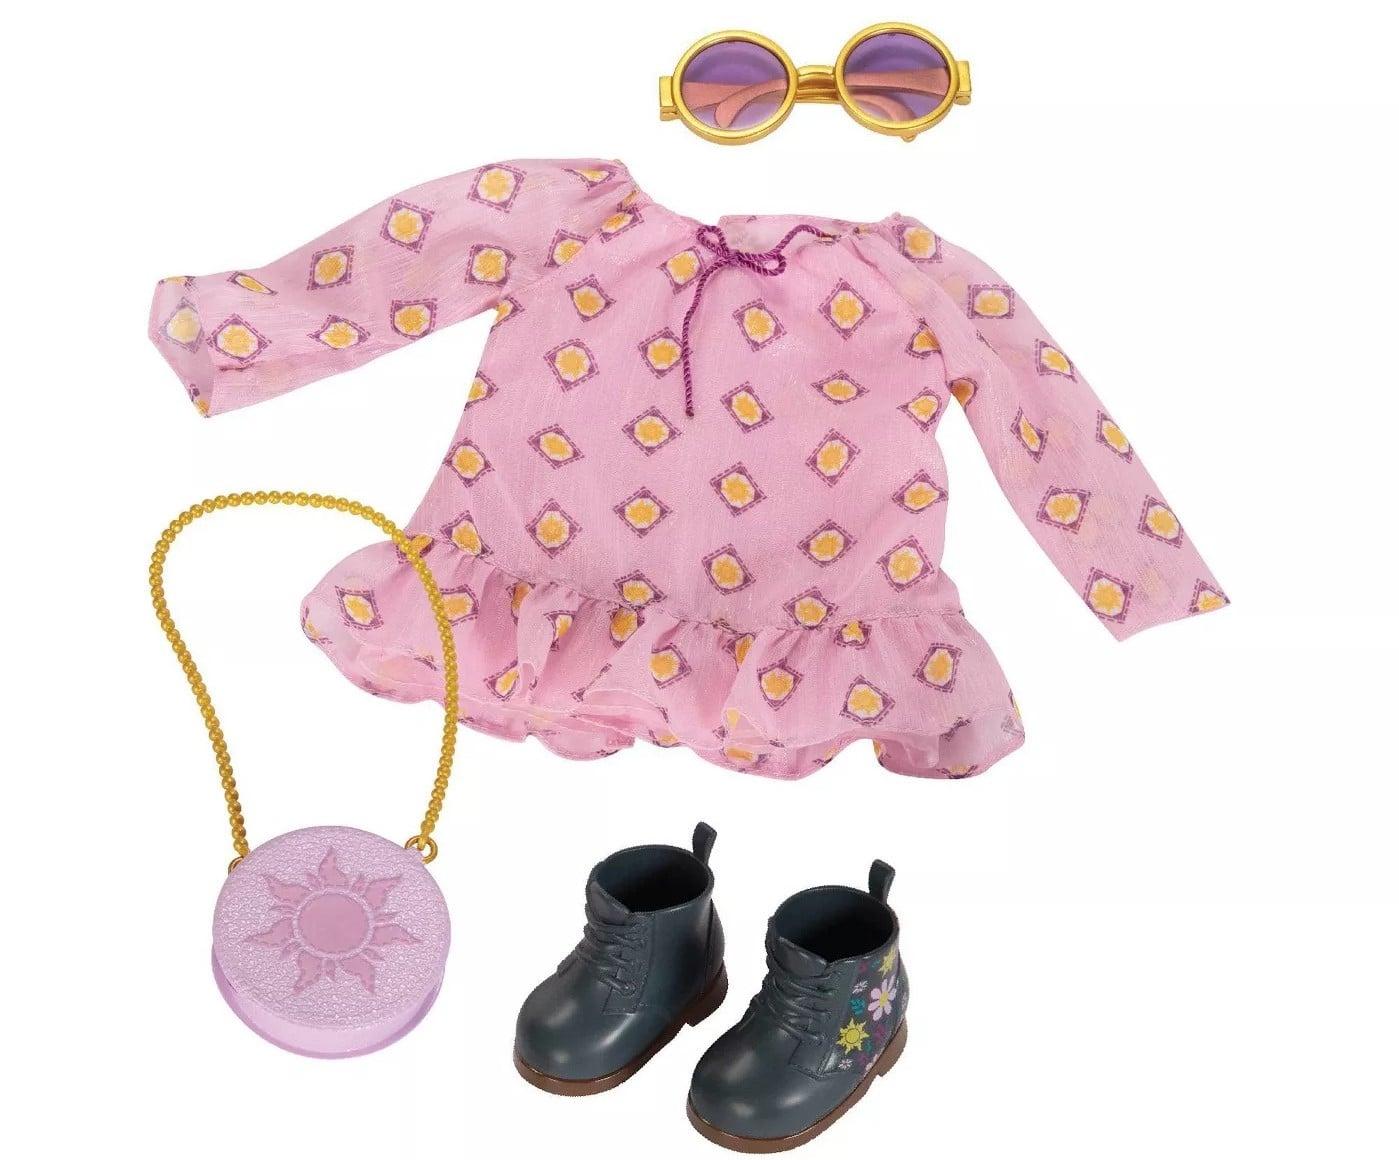 Rapunzel inspired fashion pack